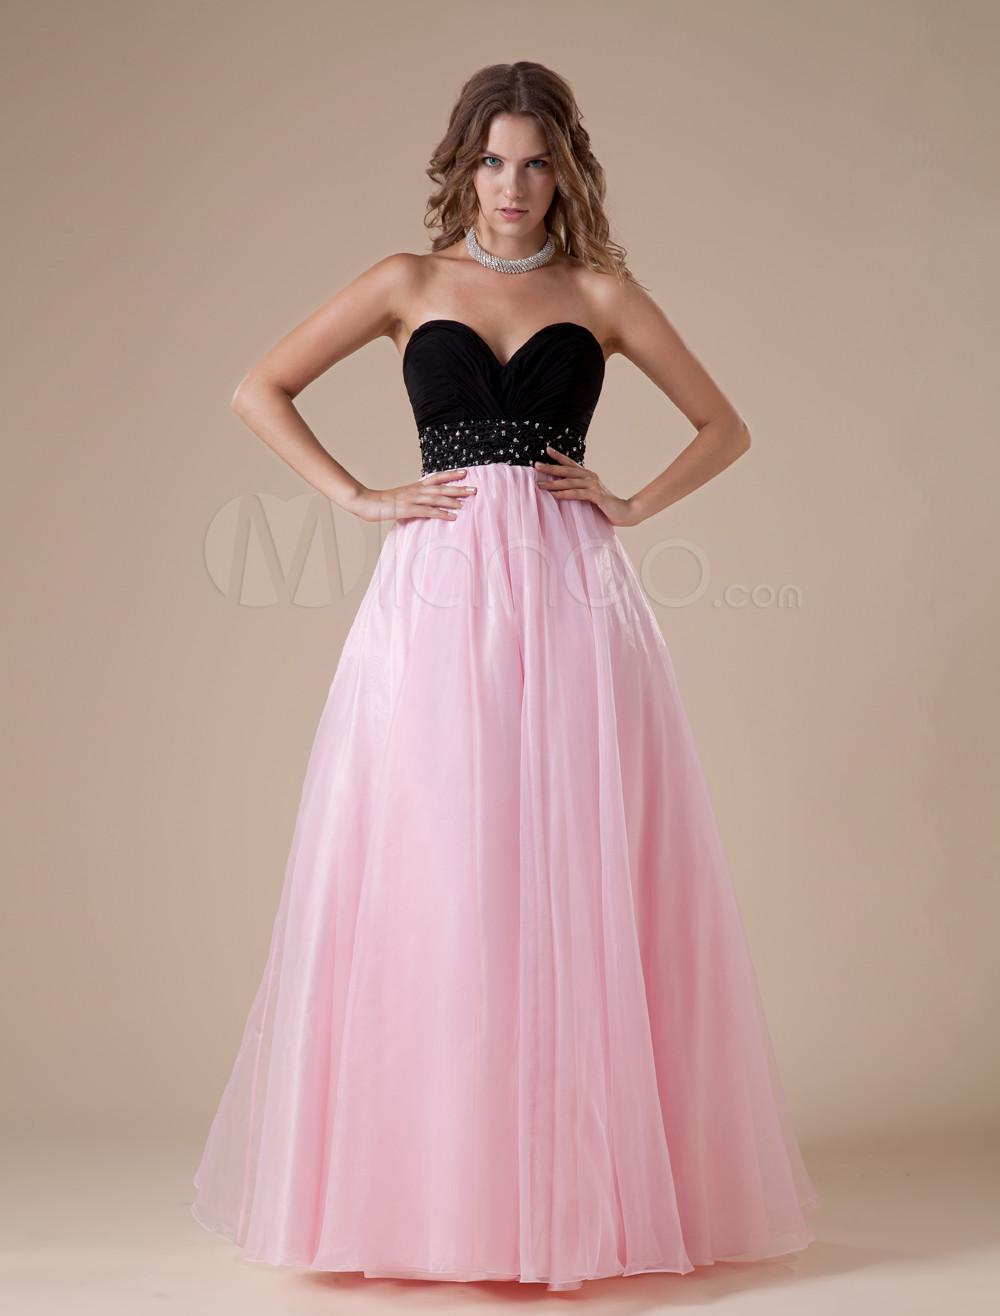 Where to buy prom dresses in san antonio